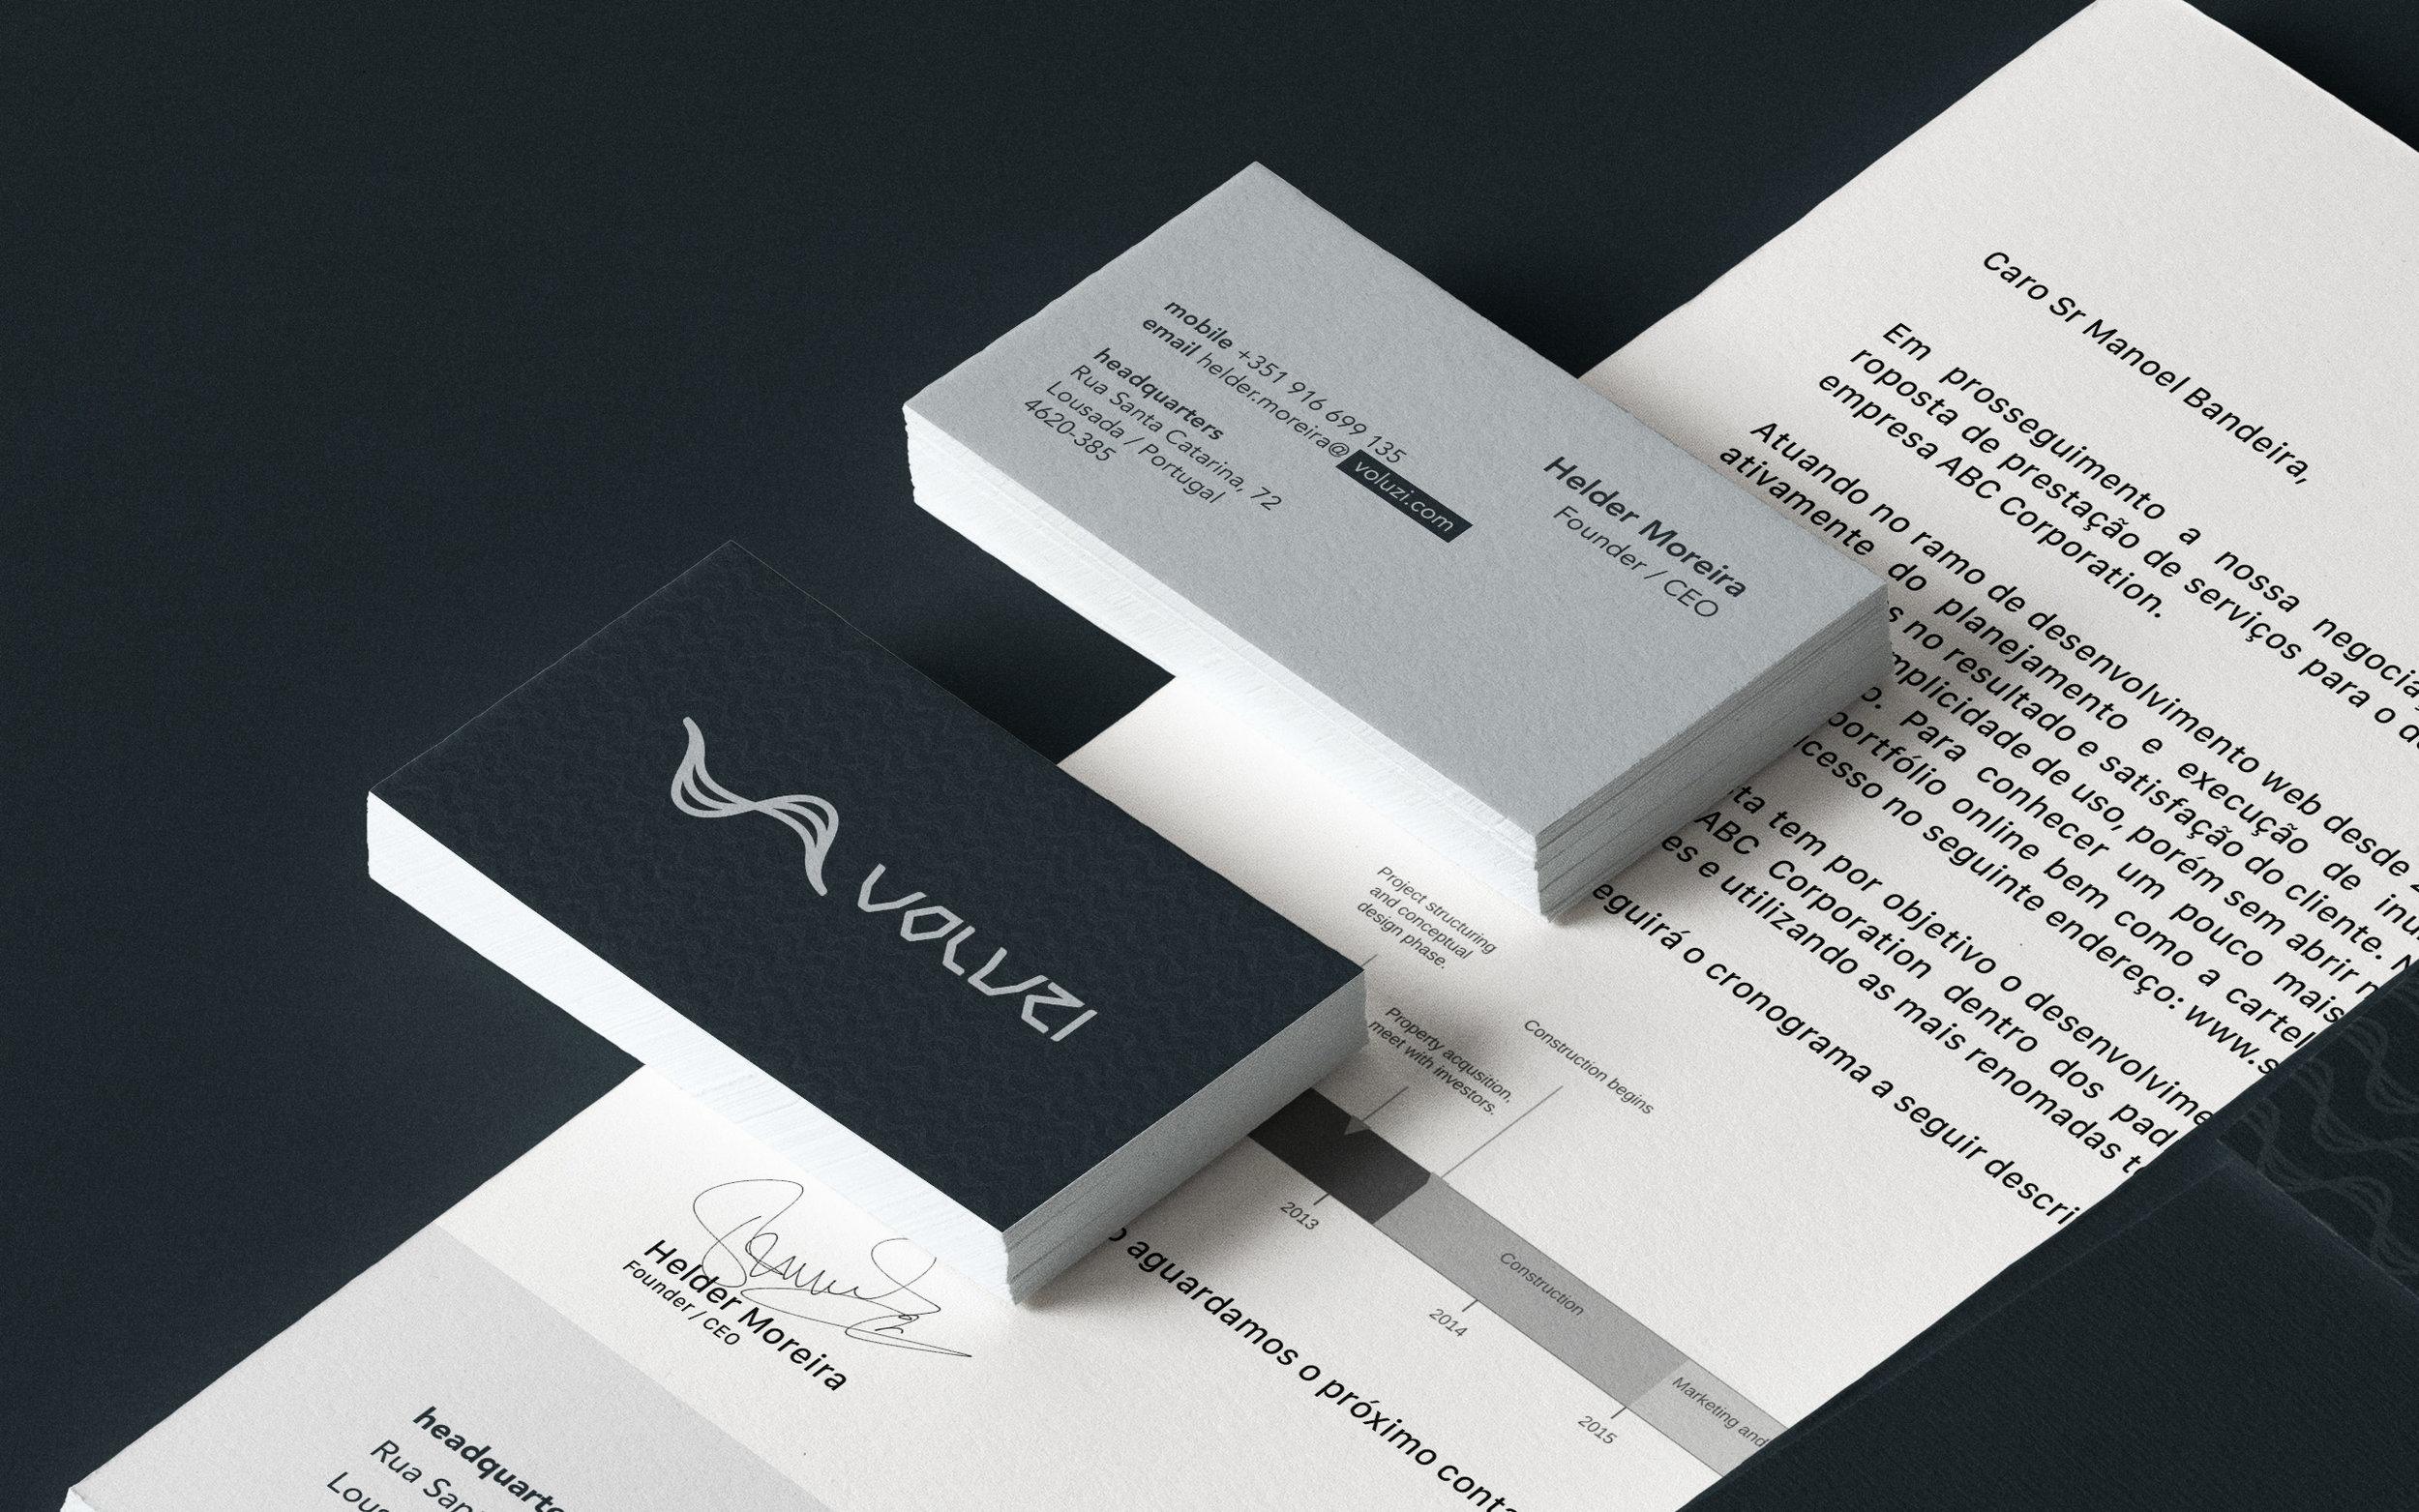 Rafael Maia - Voluzi Corporate Branding22.jpg